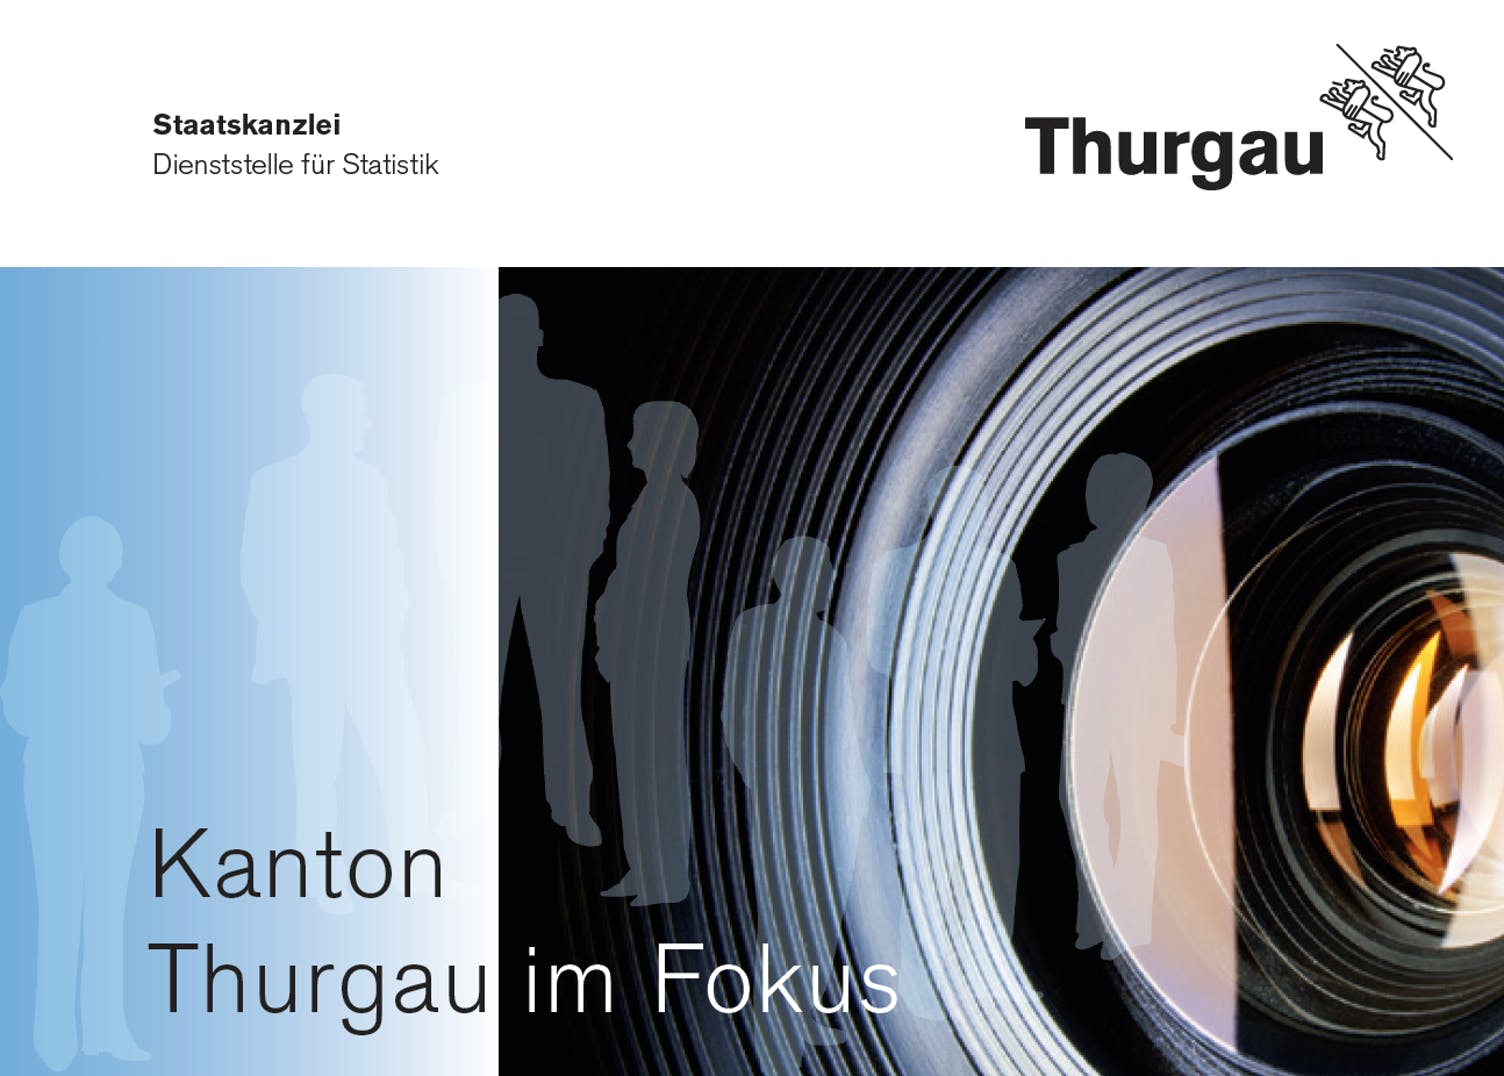 Thurgau Statistik